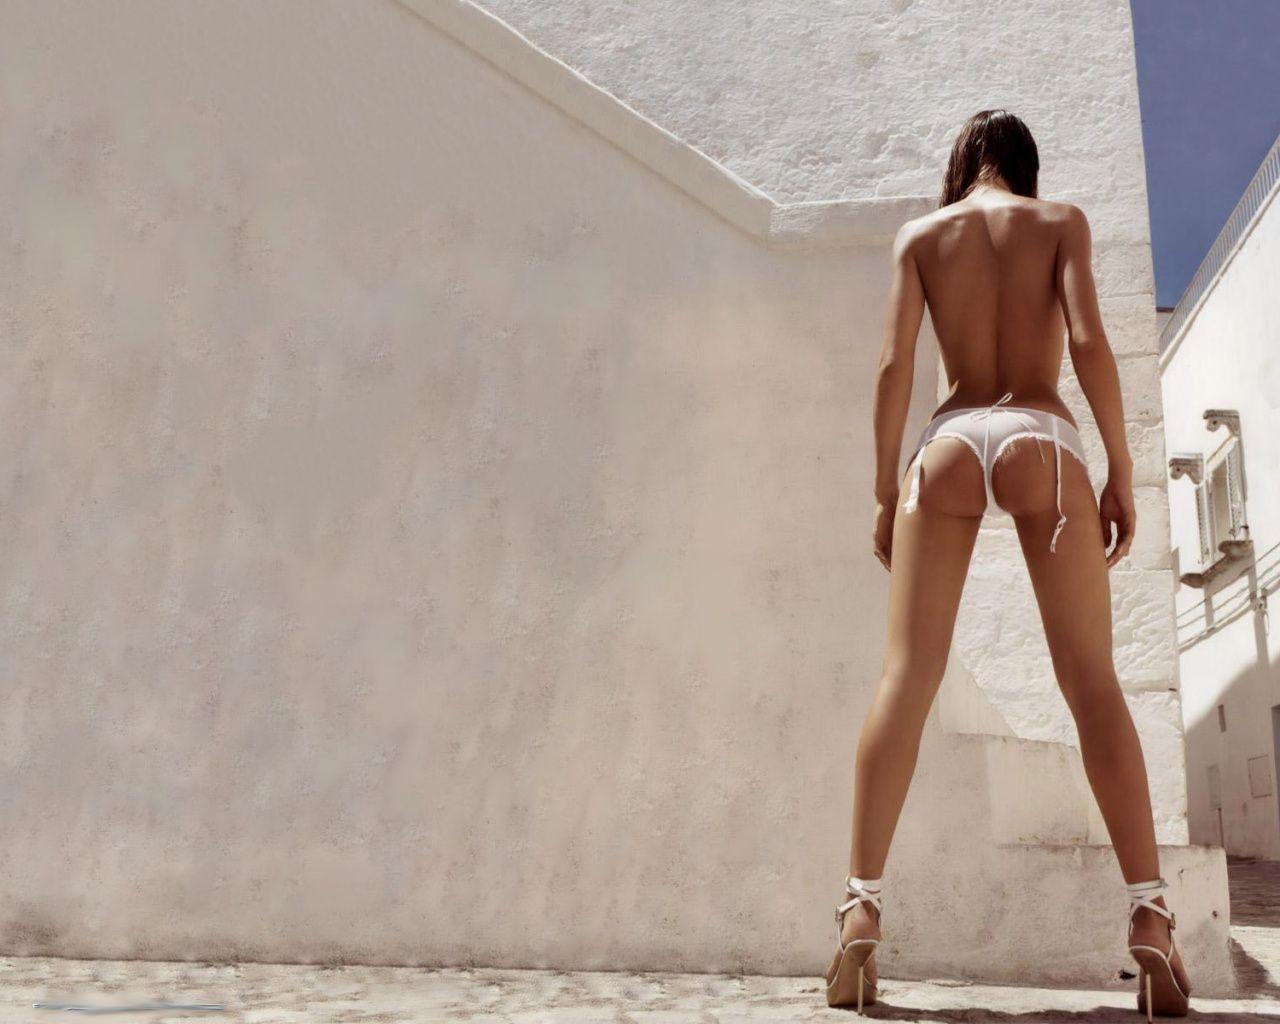 http://4.bp.blogspot.com/-wK-XQMlPk3I/UE0X4jQQtgI/AAAAAAAAWSY/nqE-mEDVIro/s1600/1296383240_perfect-sexy-ass.jpg